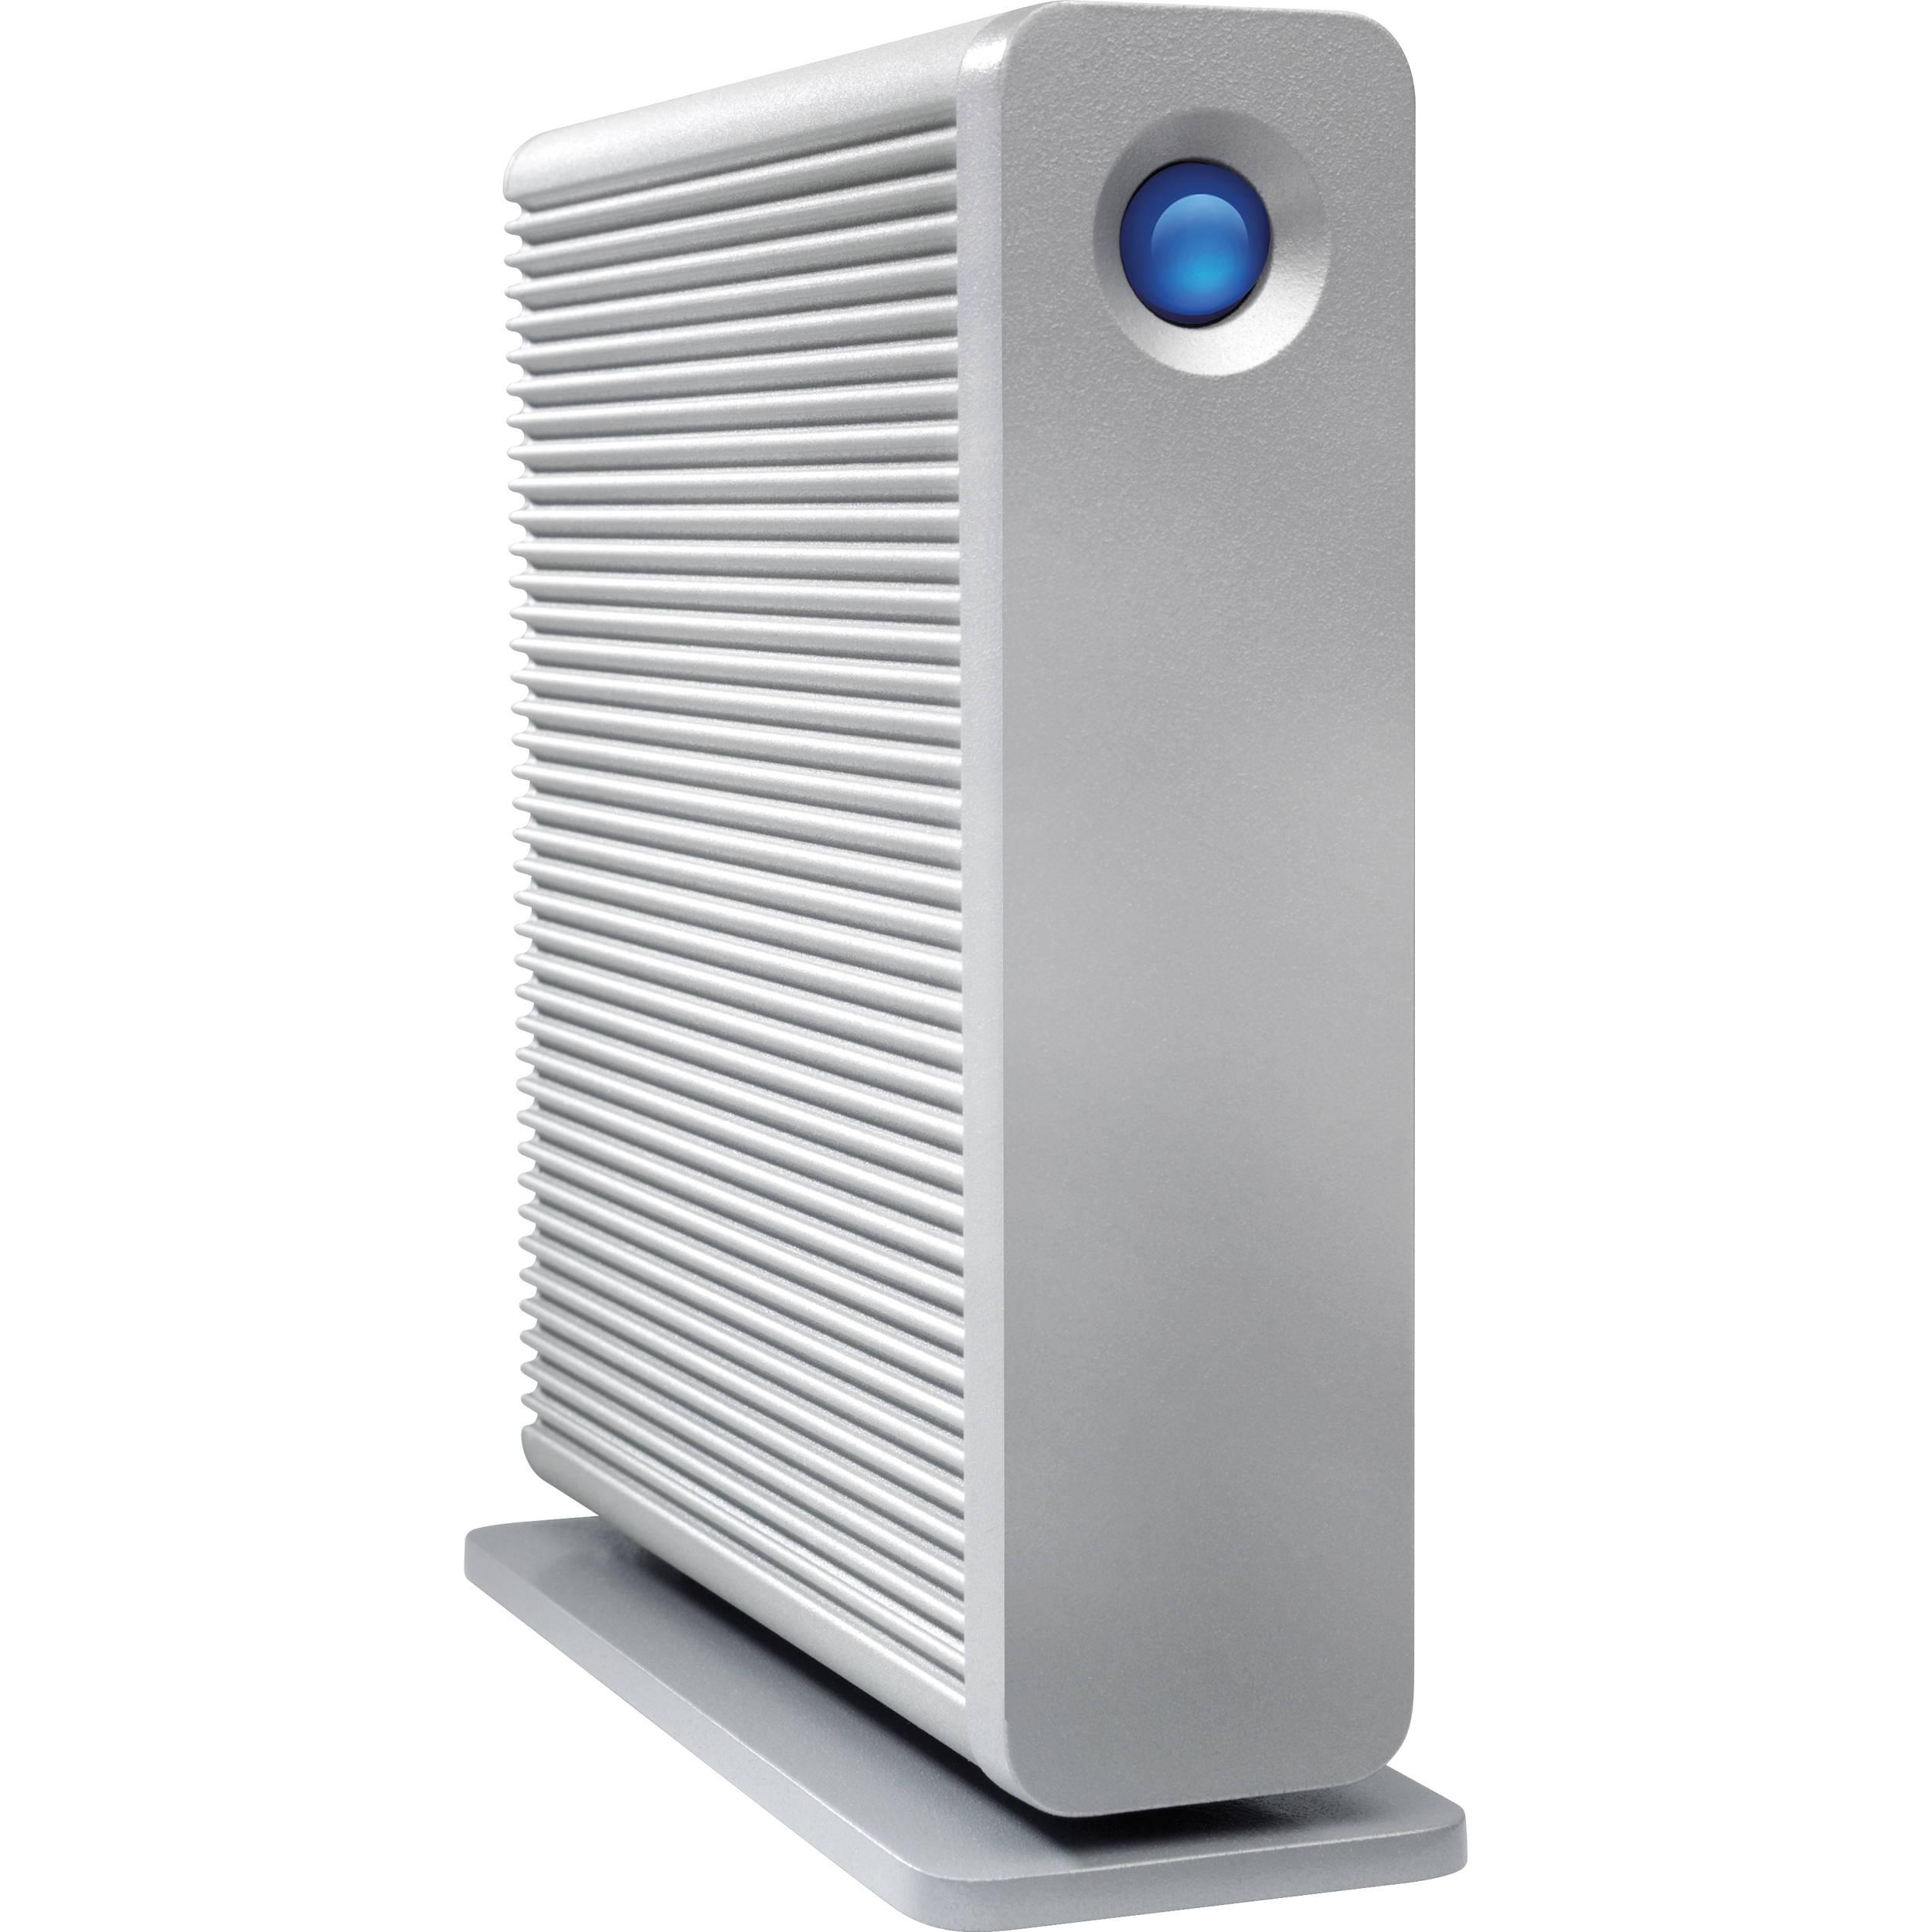 Lacie D2-9000465 5 TB External Hard Disk Image